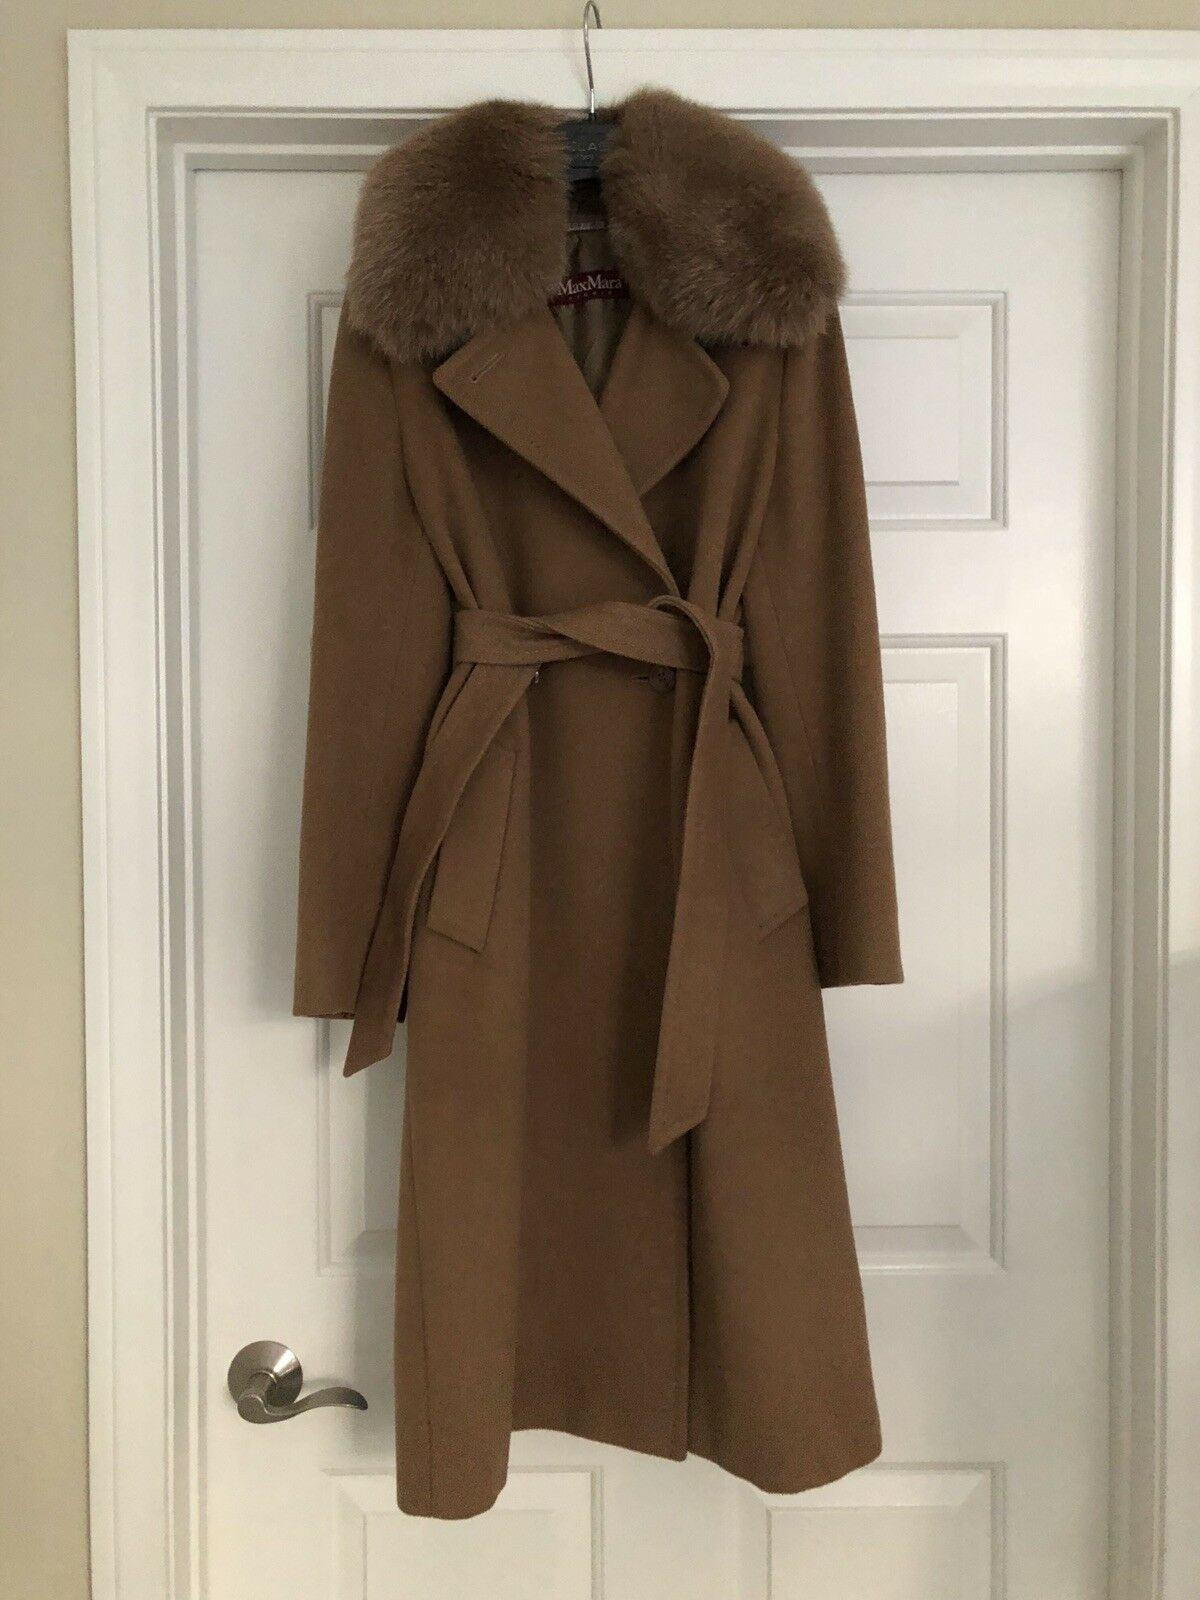 Max Mara Studio Coat, Size 8